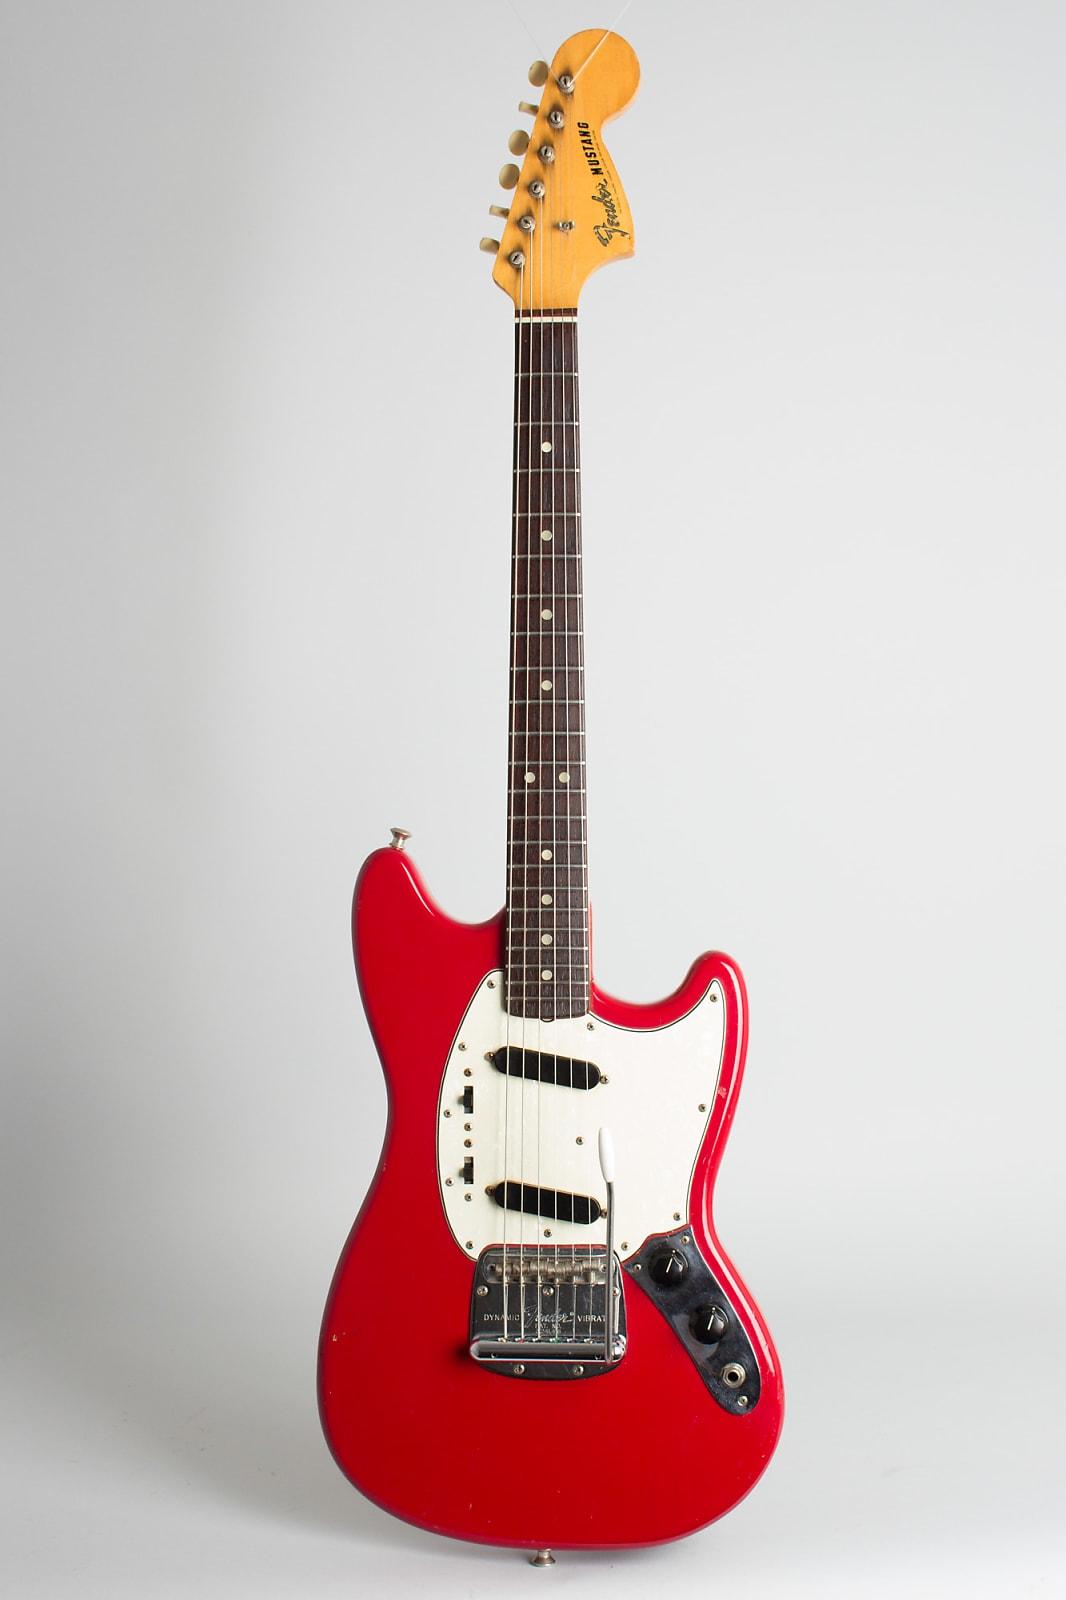 Fender  Mustang Solid Body Electric Guitar (1968), ser. #224967, original grey hard shell case.